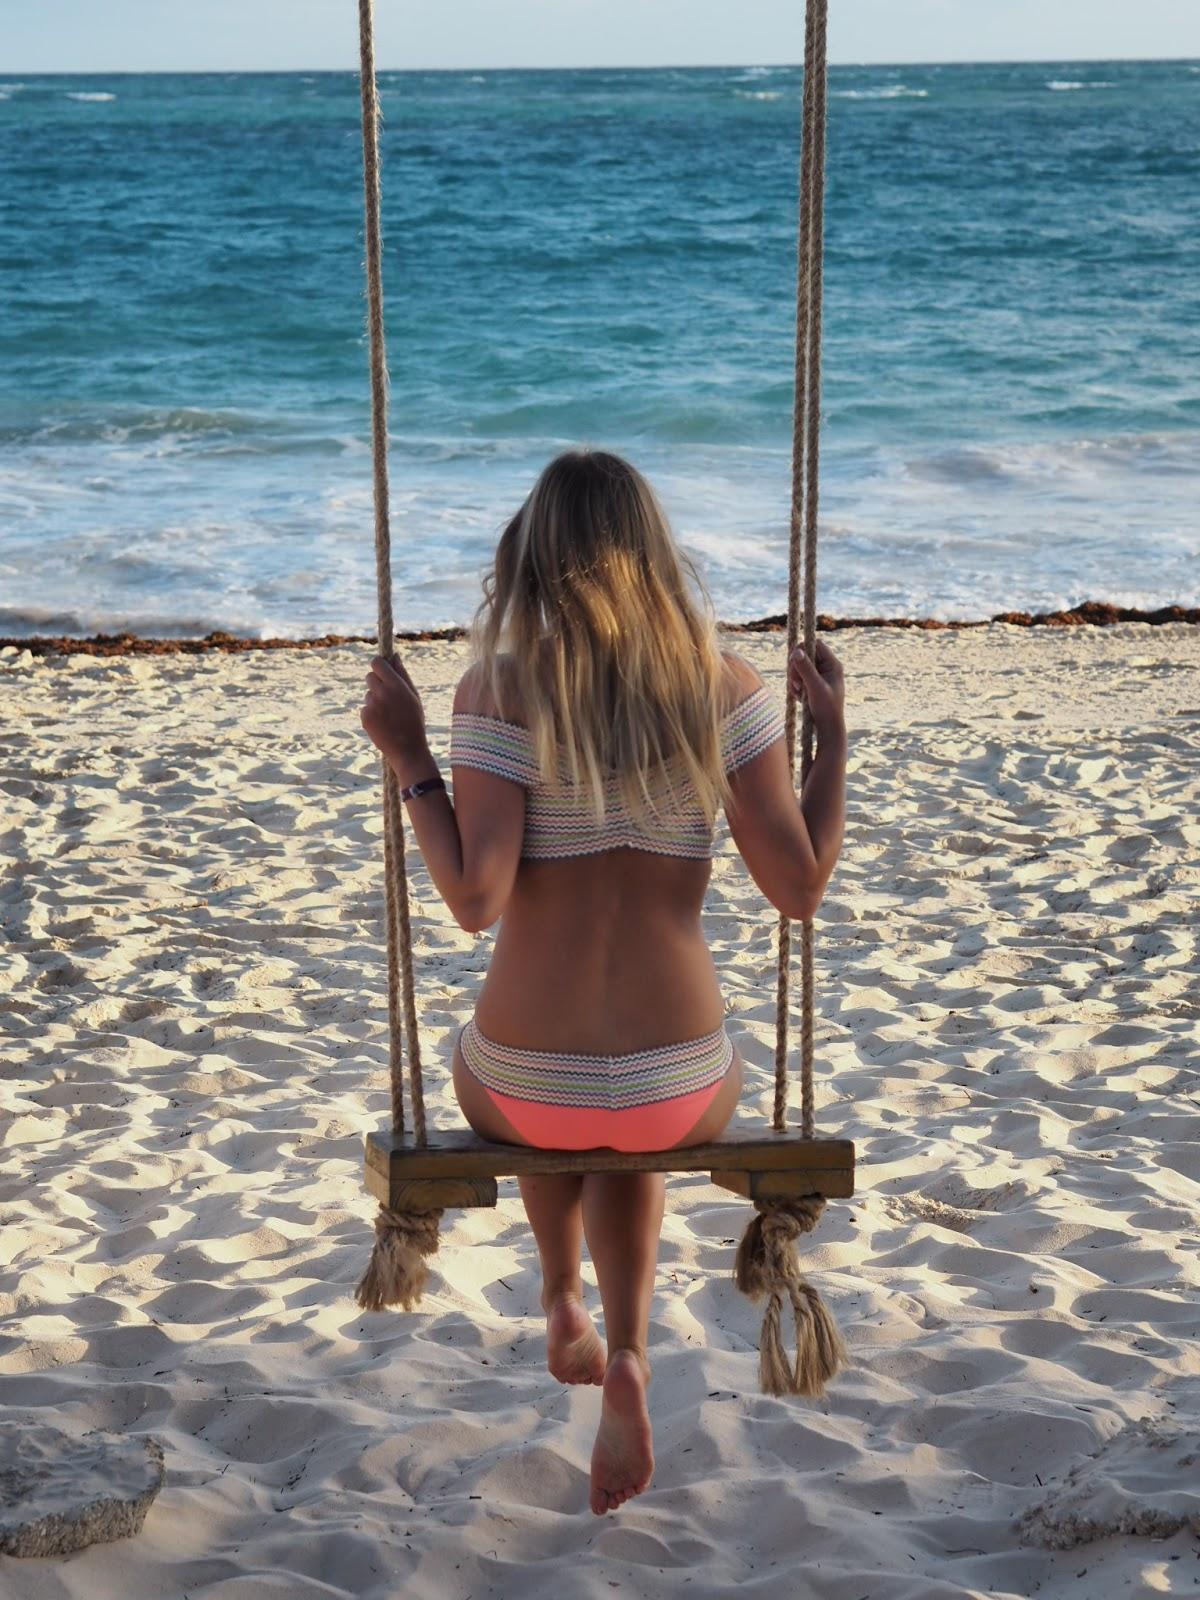 Rachel Emily on Beach Swing looking out to sea - River Island Bardot Bikini